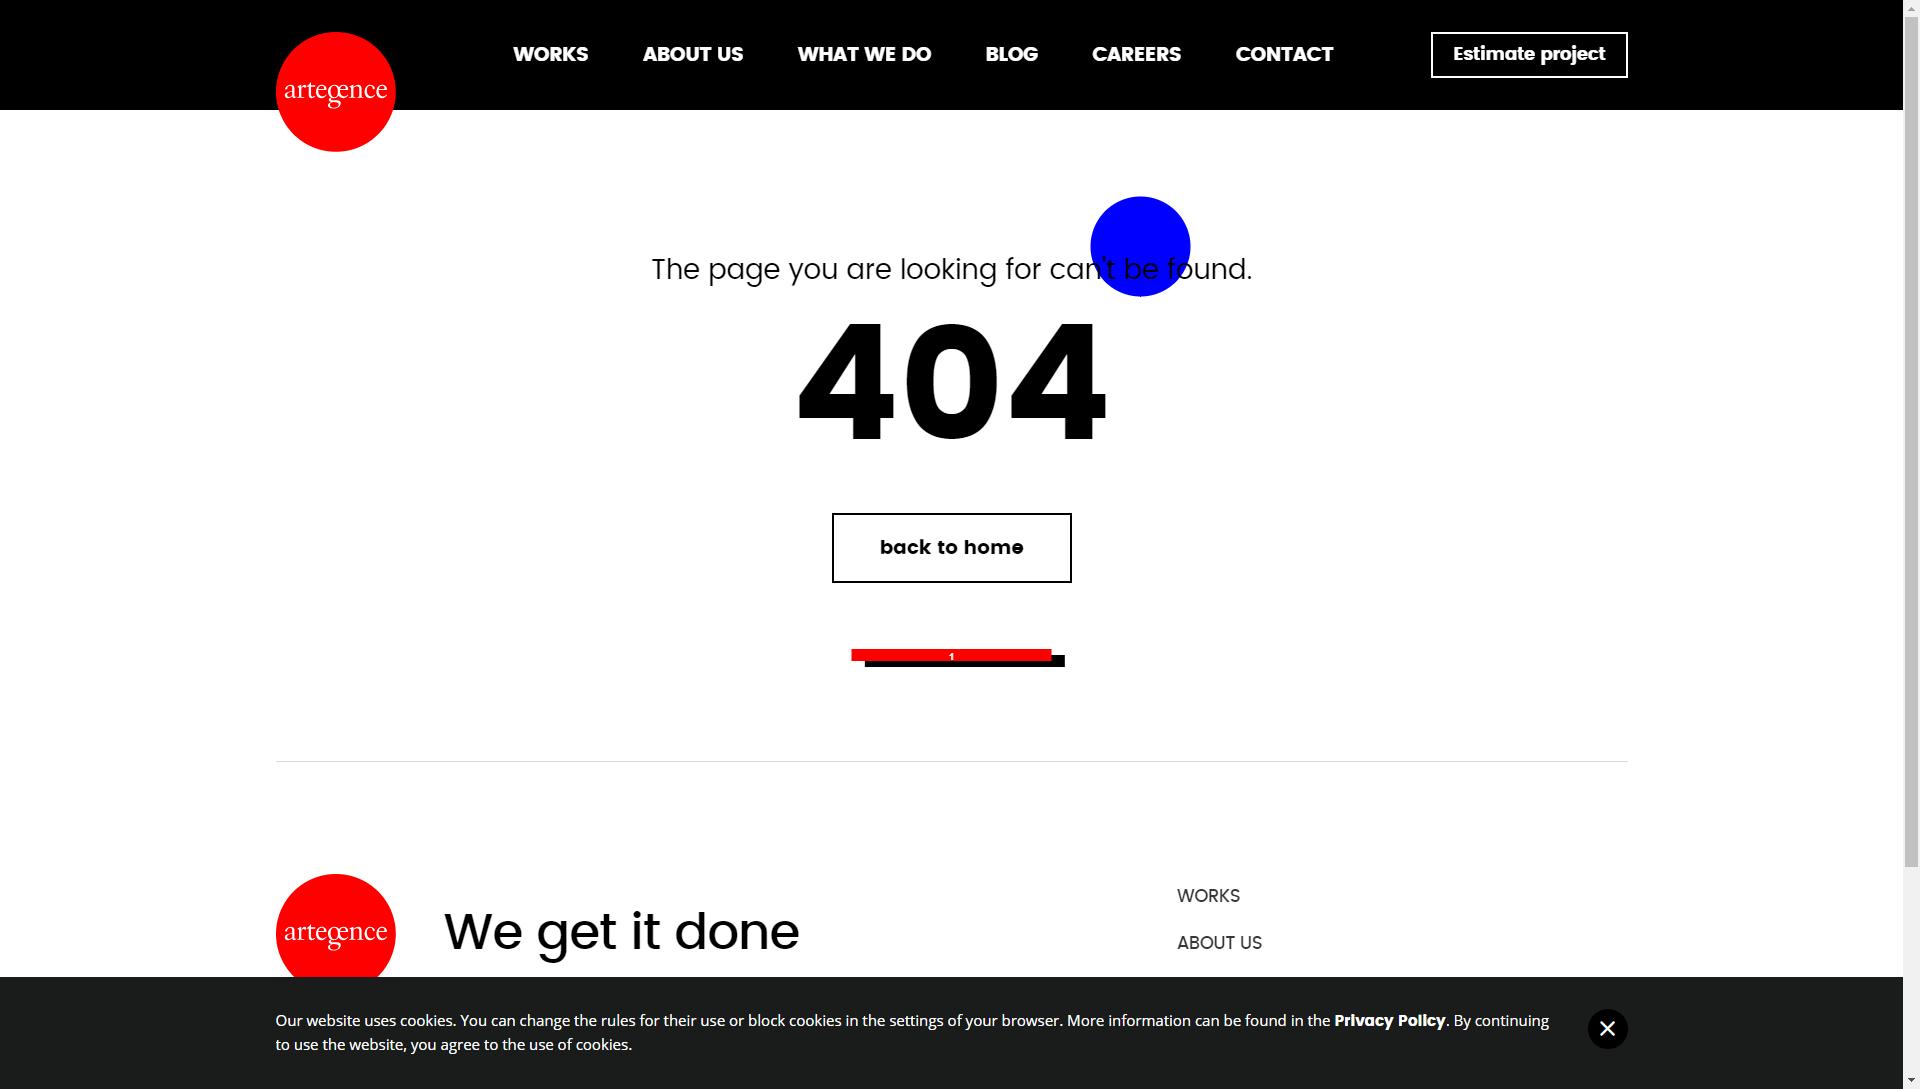 Good 404 example